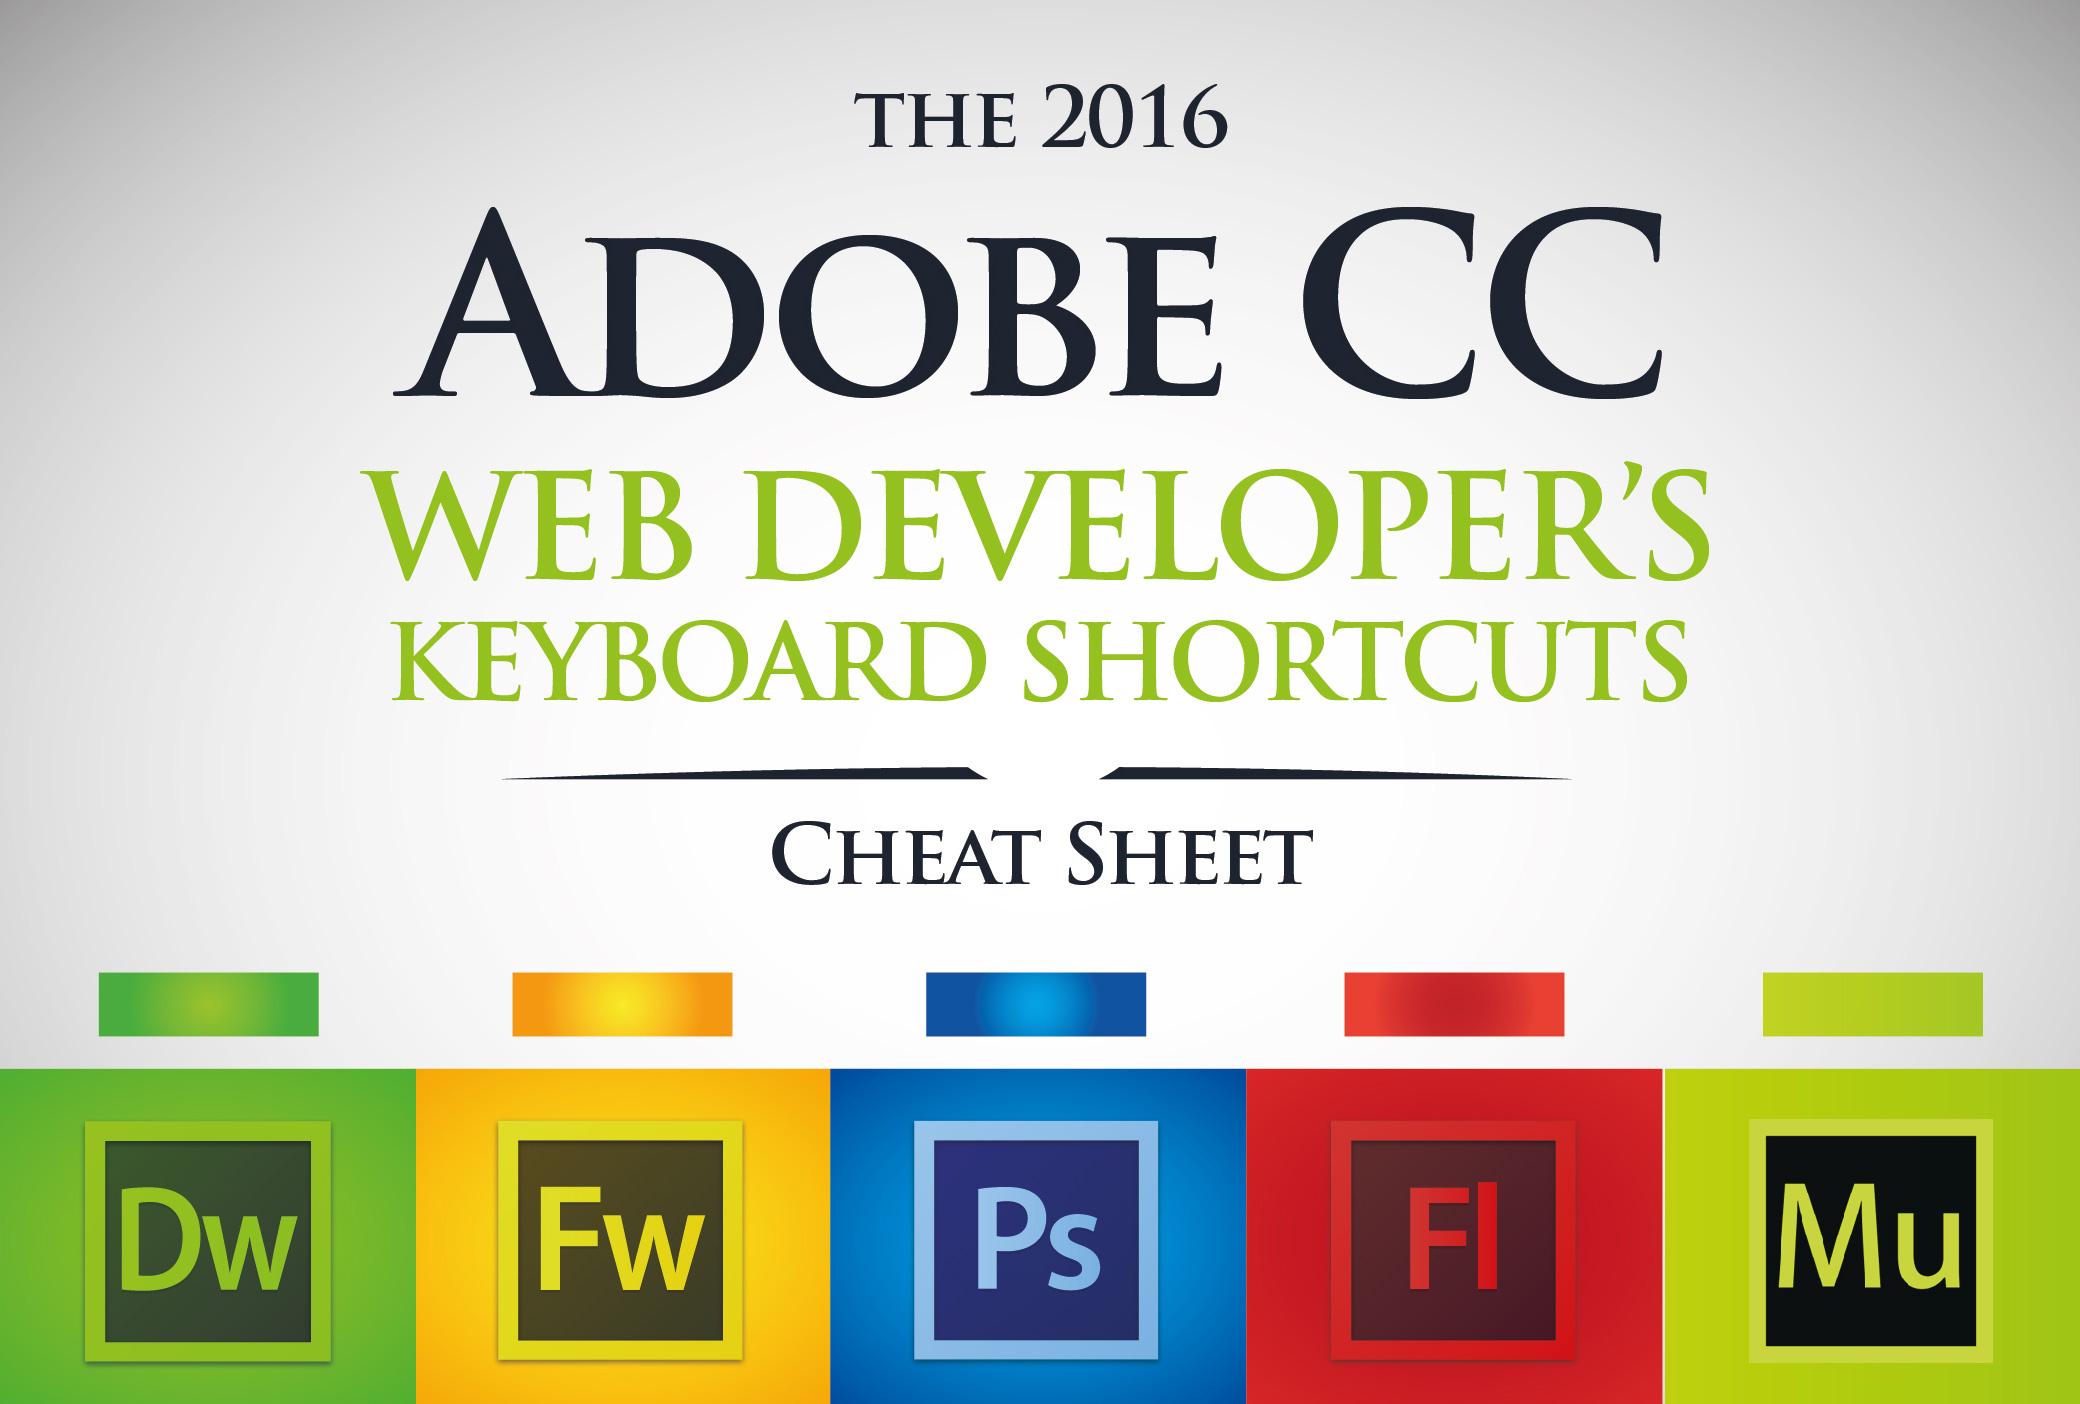 Adobe, Adobe CC, Cheat Sheet, Keyboard Shortcuts